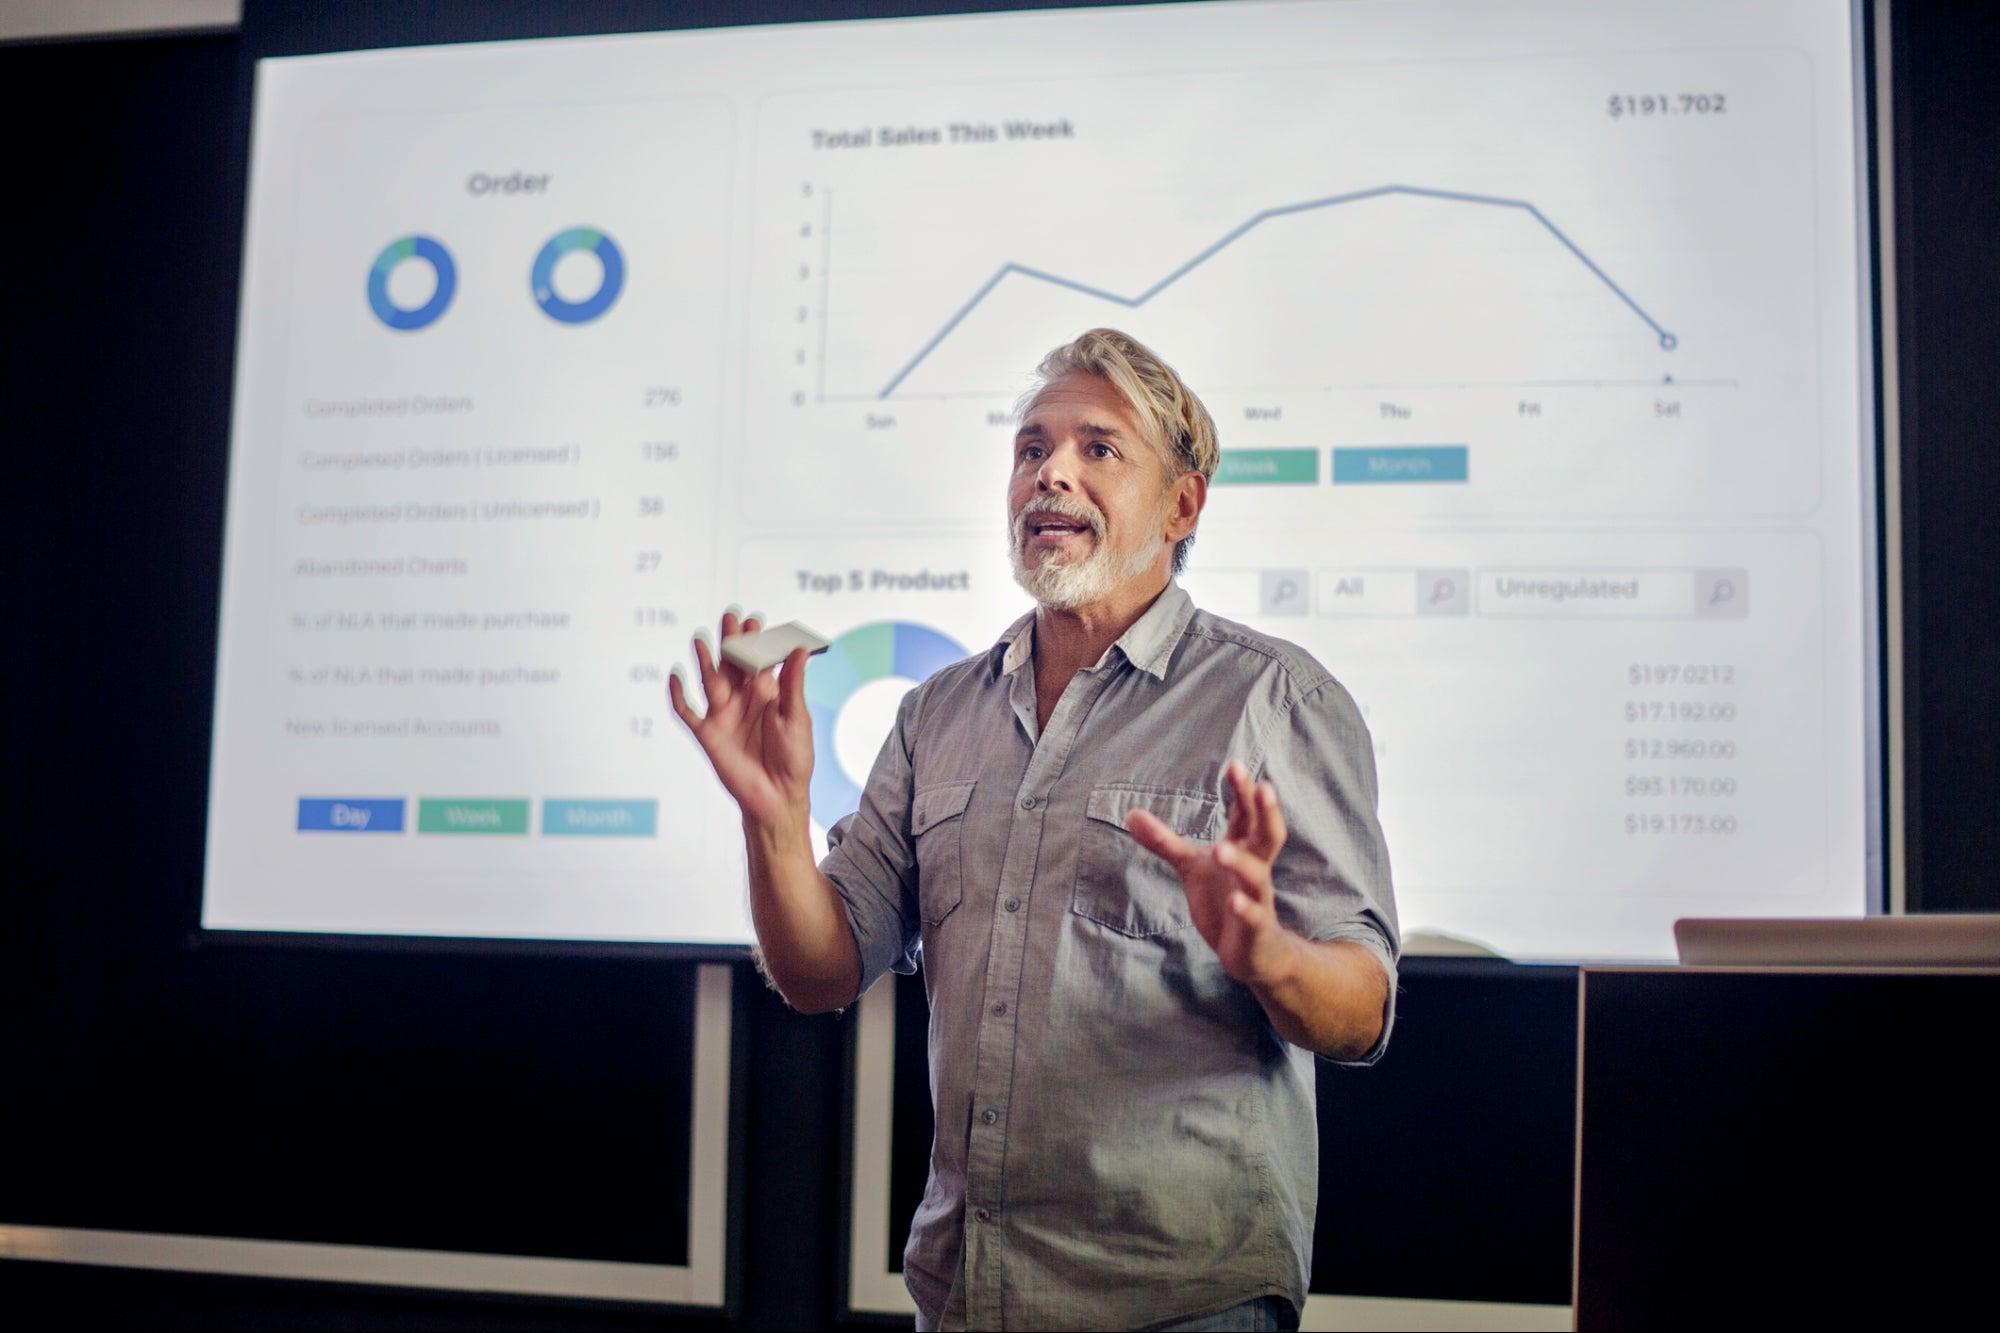 4 Pro Tips for Optimal Online Presentations